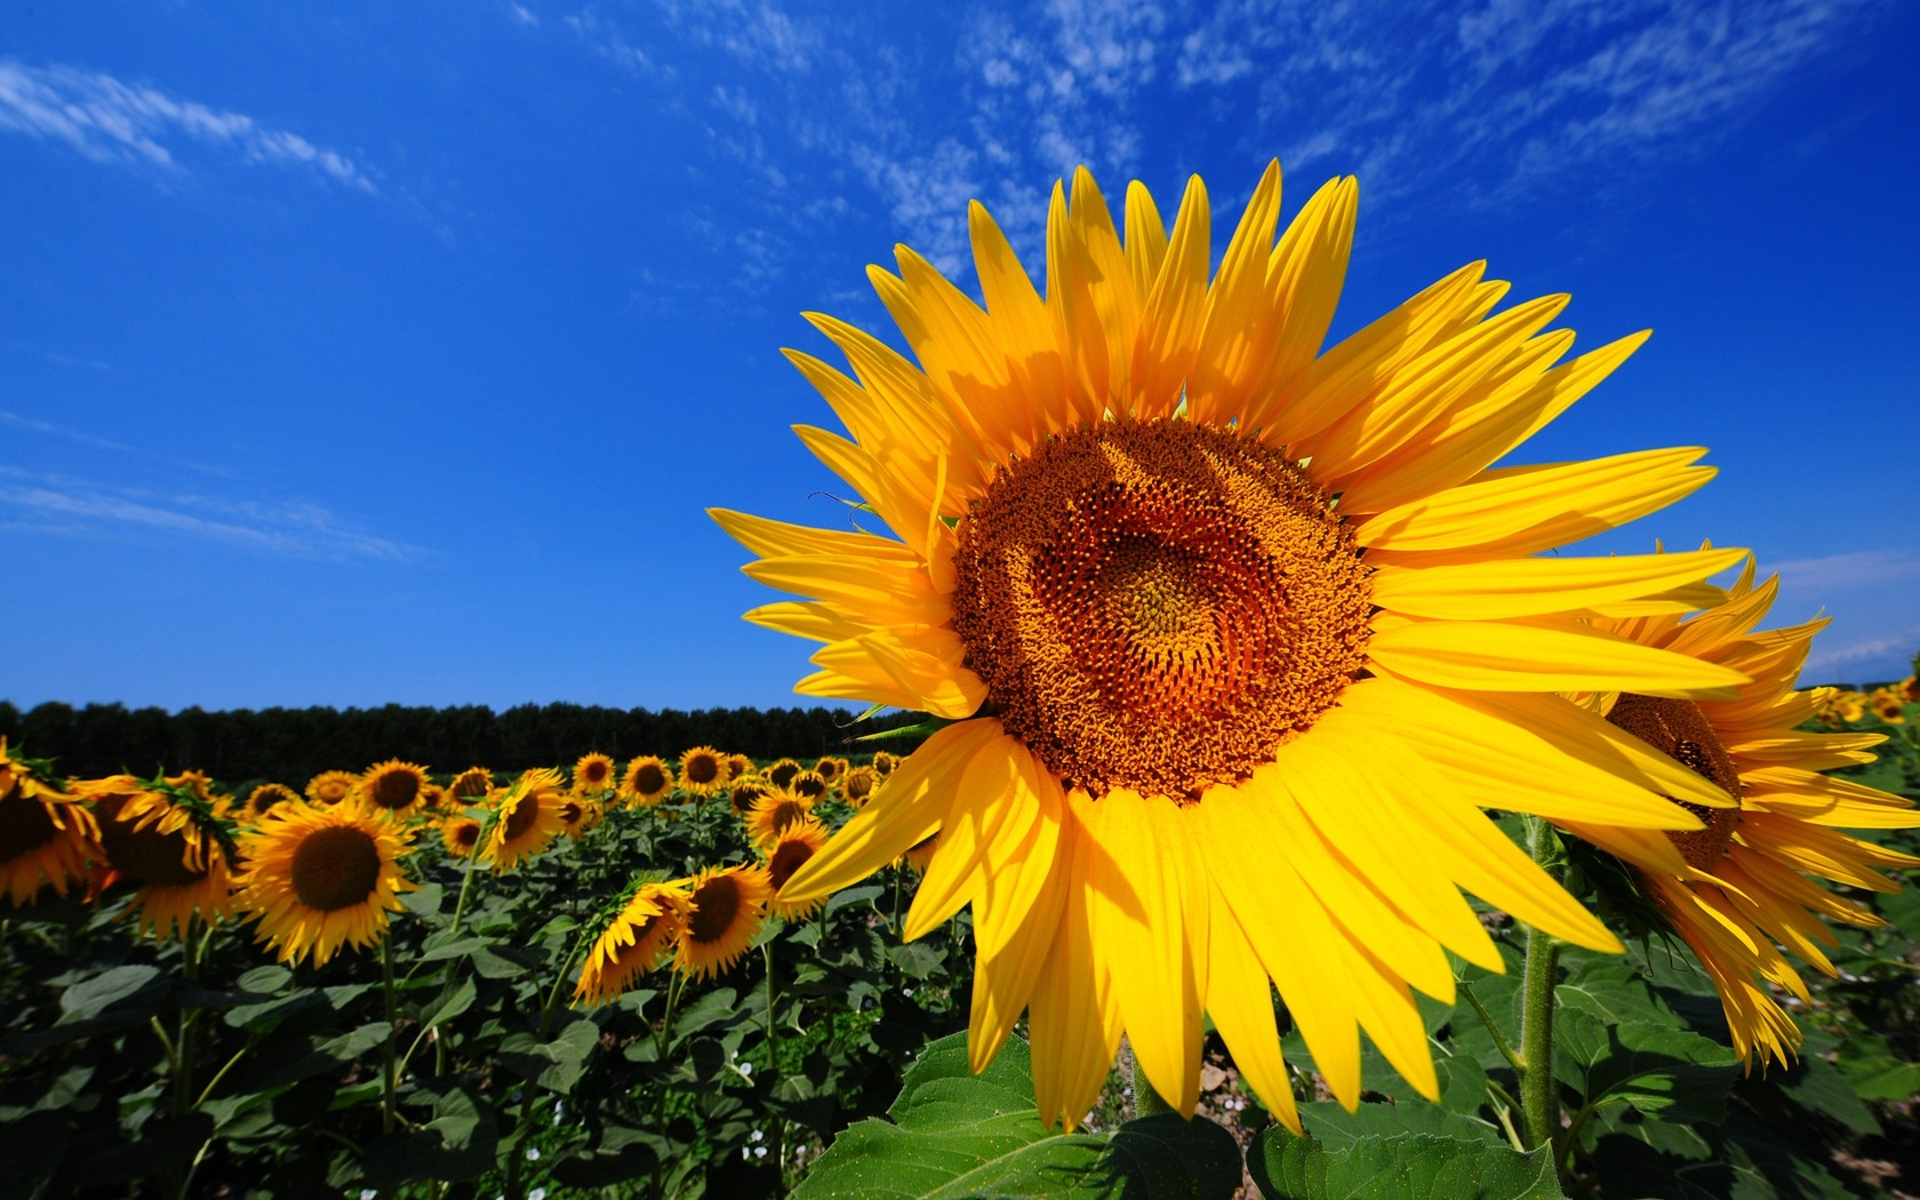 Sunflower Fields Wallpaper Desktop Hq Hd Wallpaper